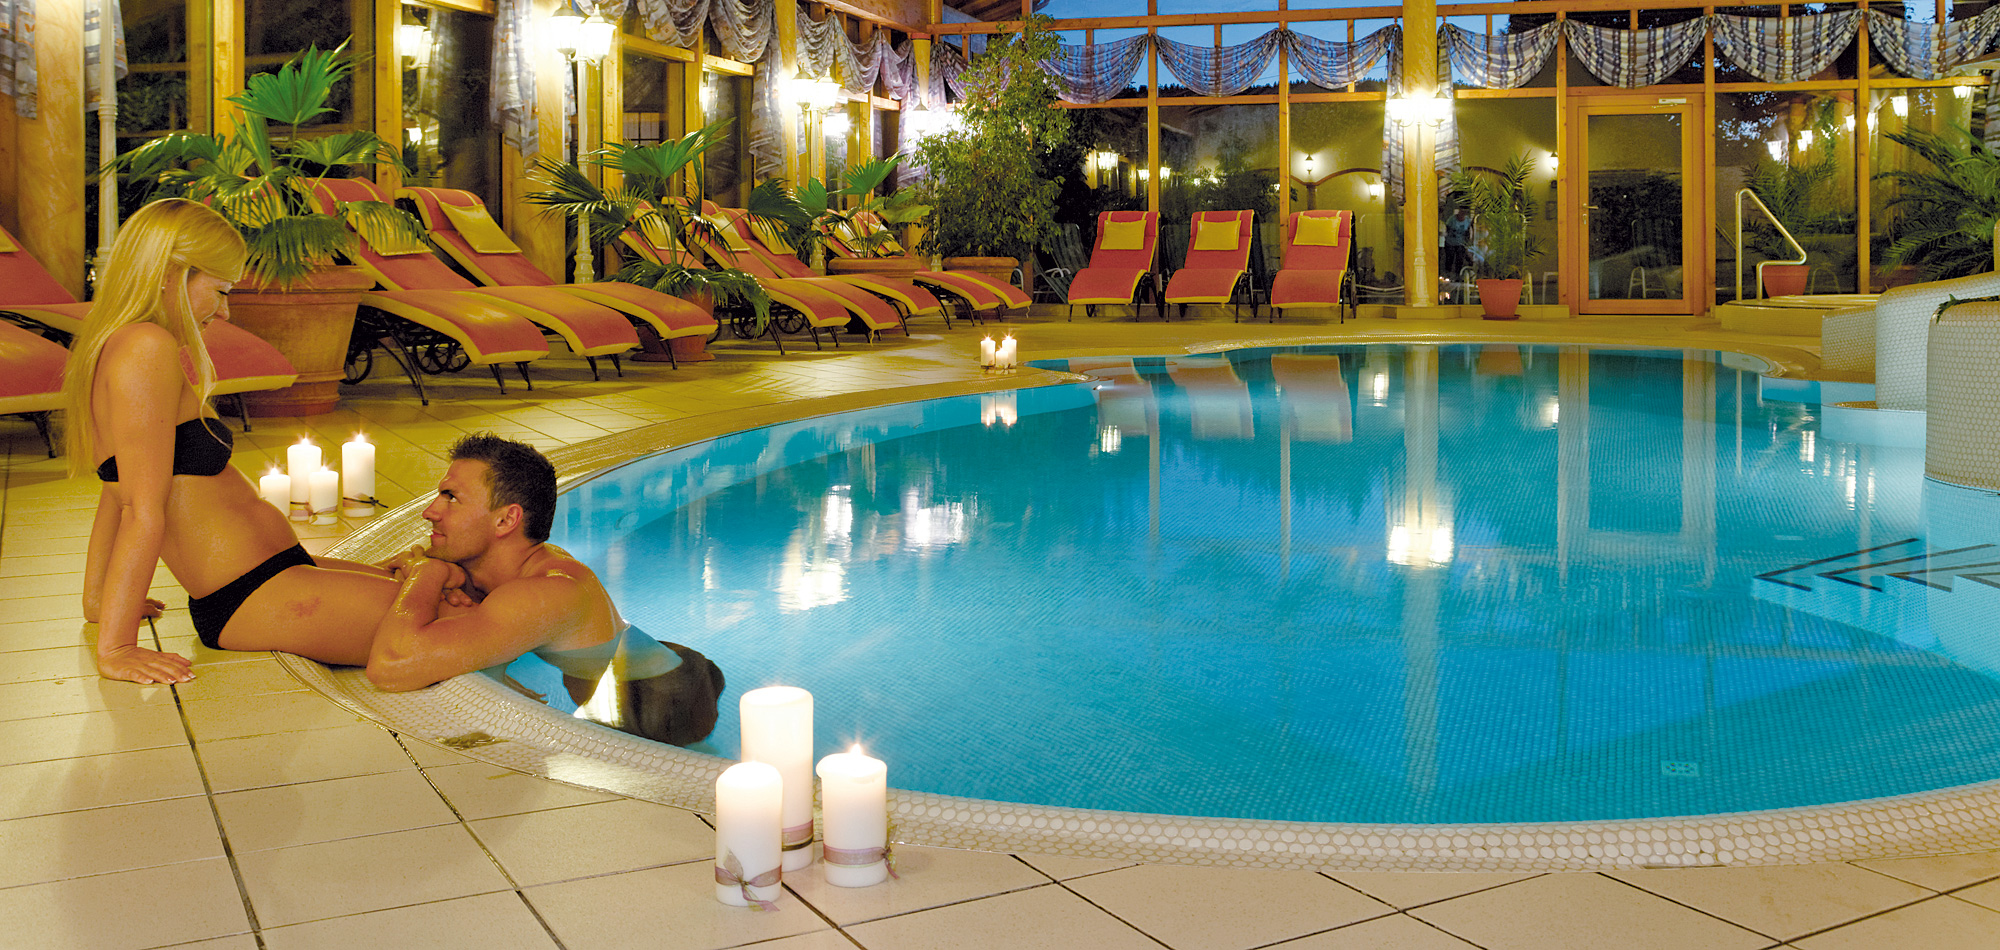 Sterne Hotel Fitnessraum